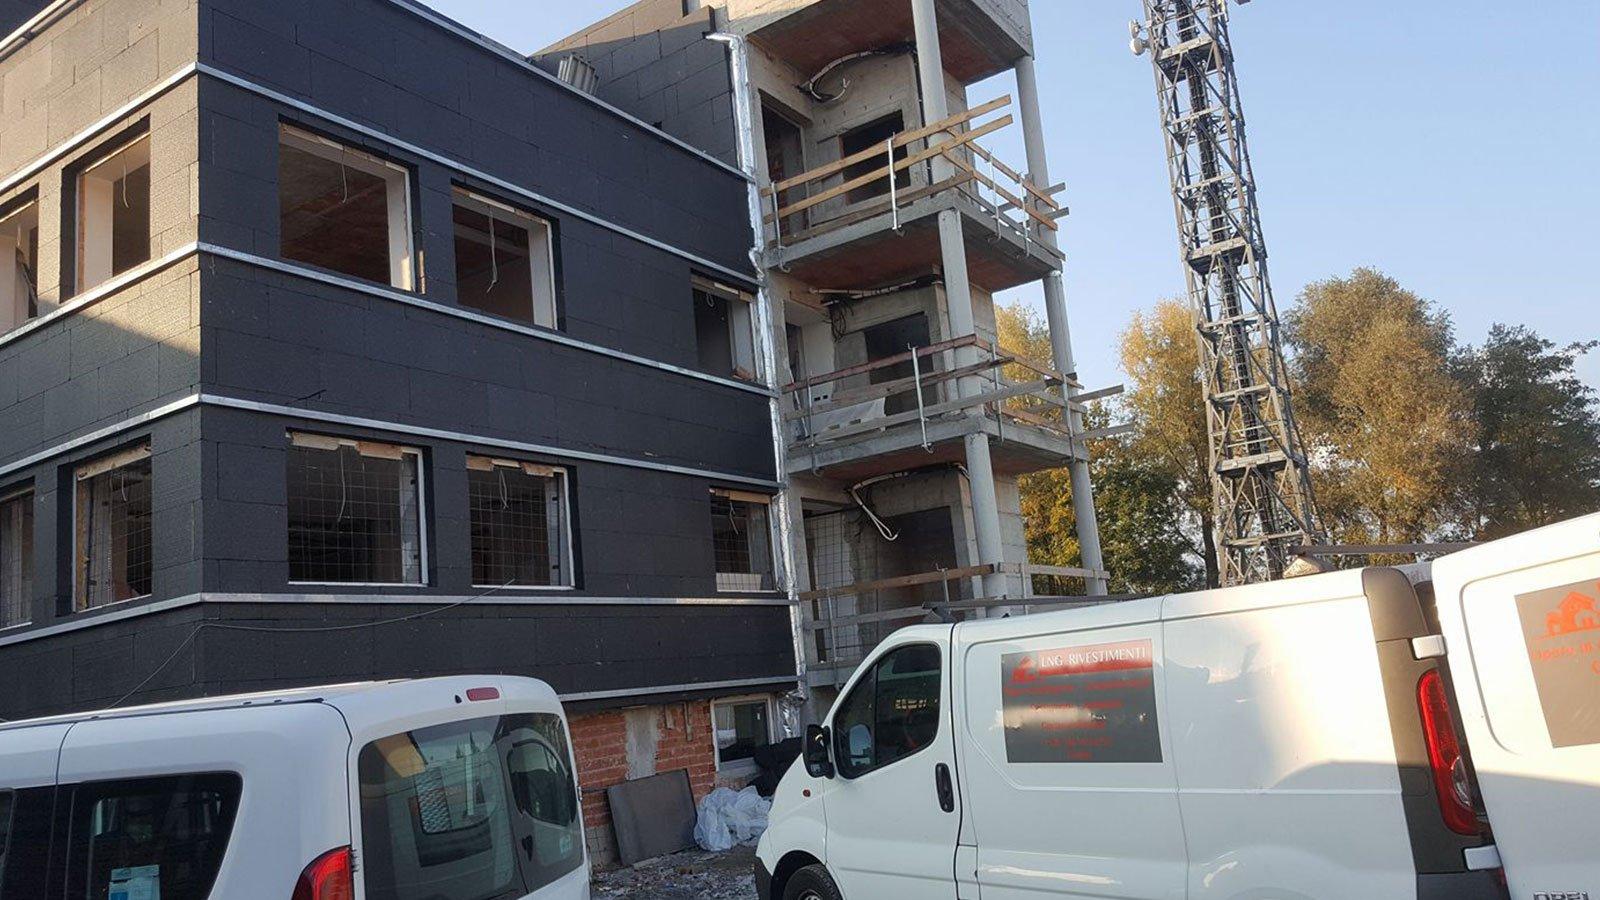 due furgoni bianchi di fronte a uno stabile in costruzione